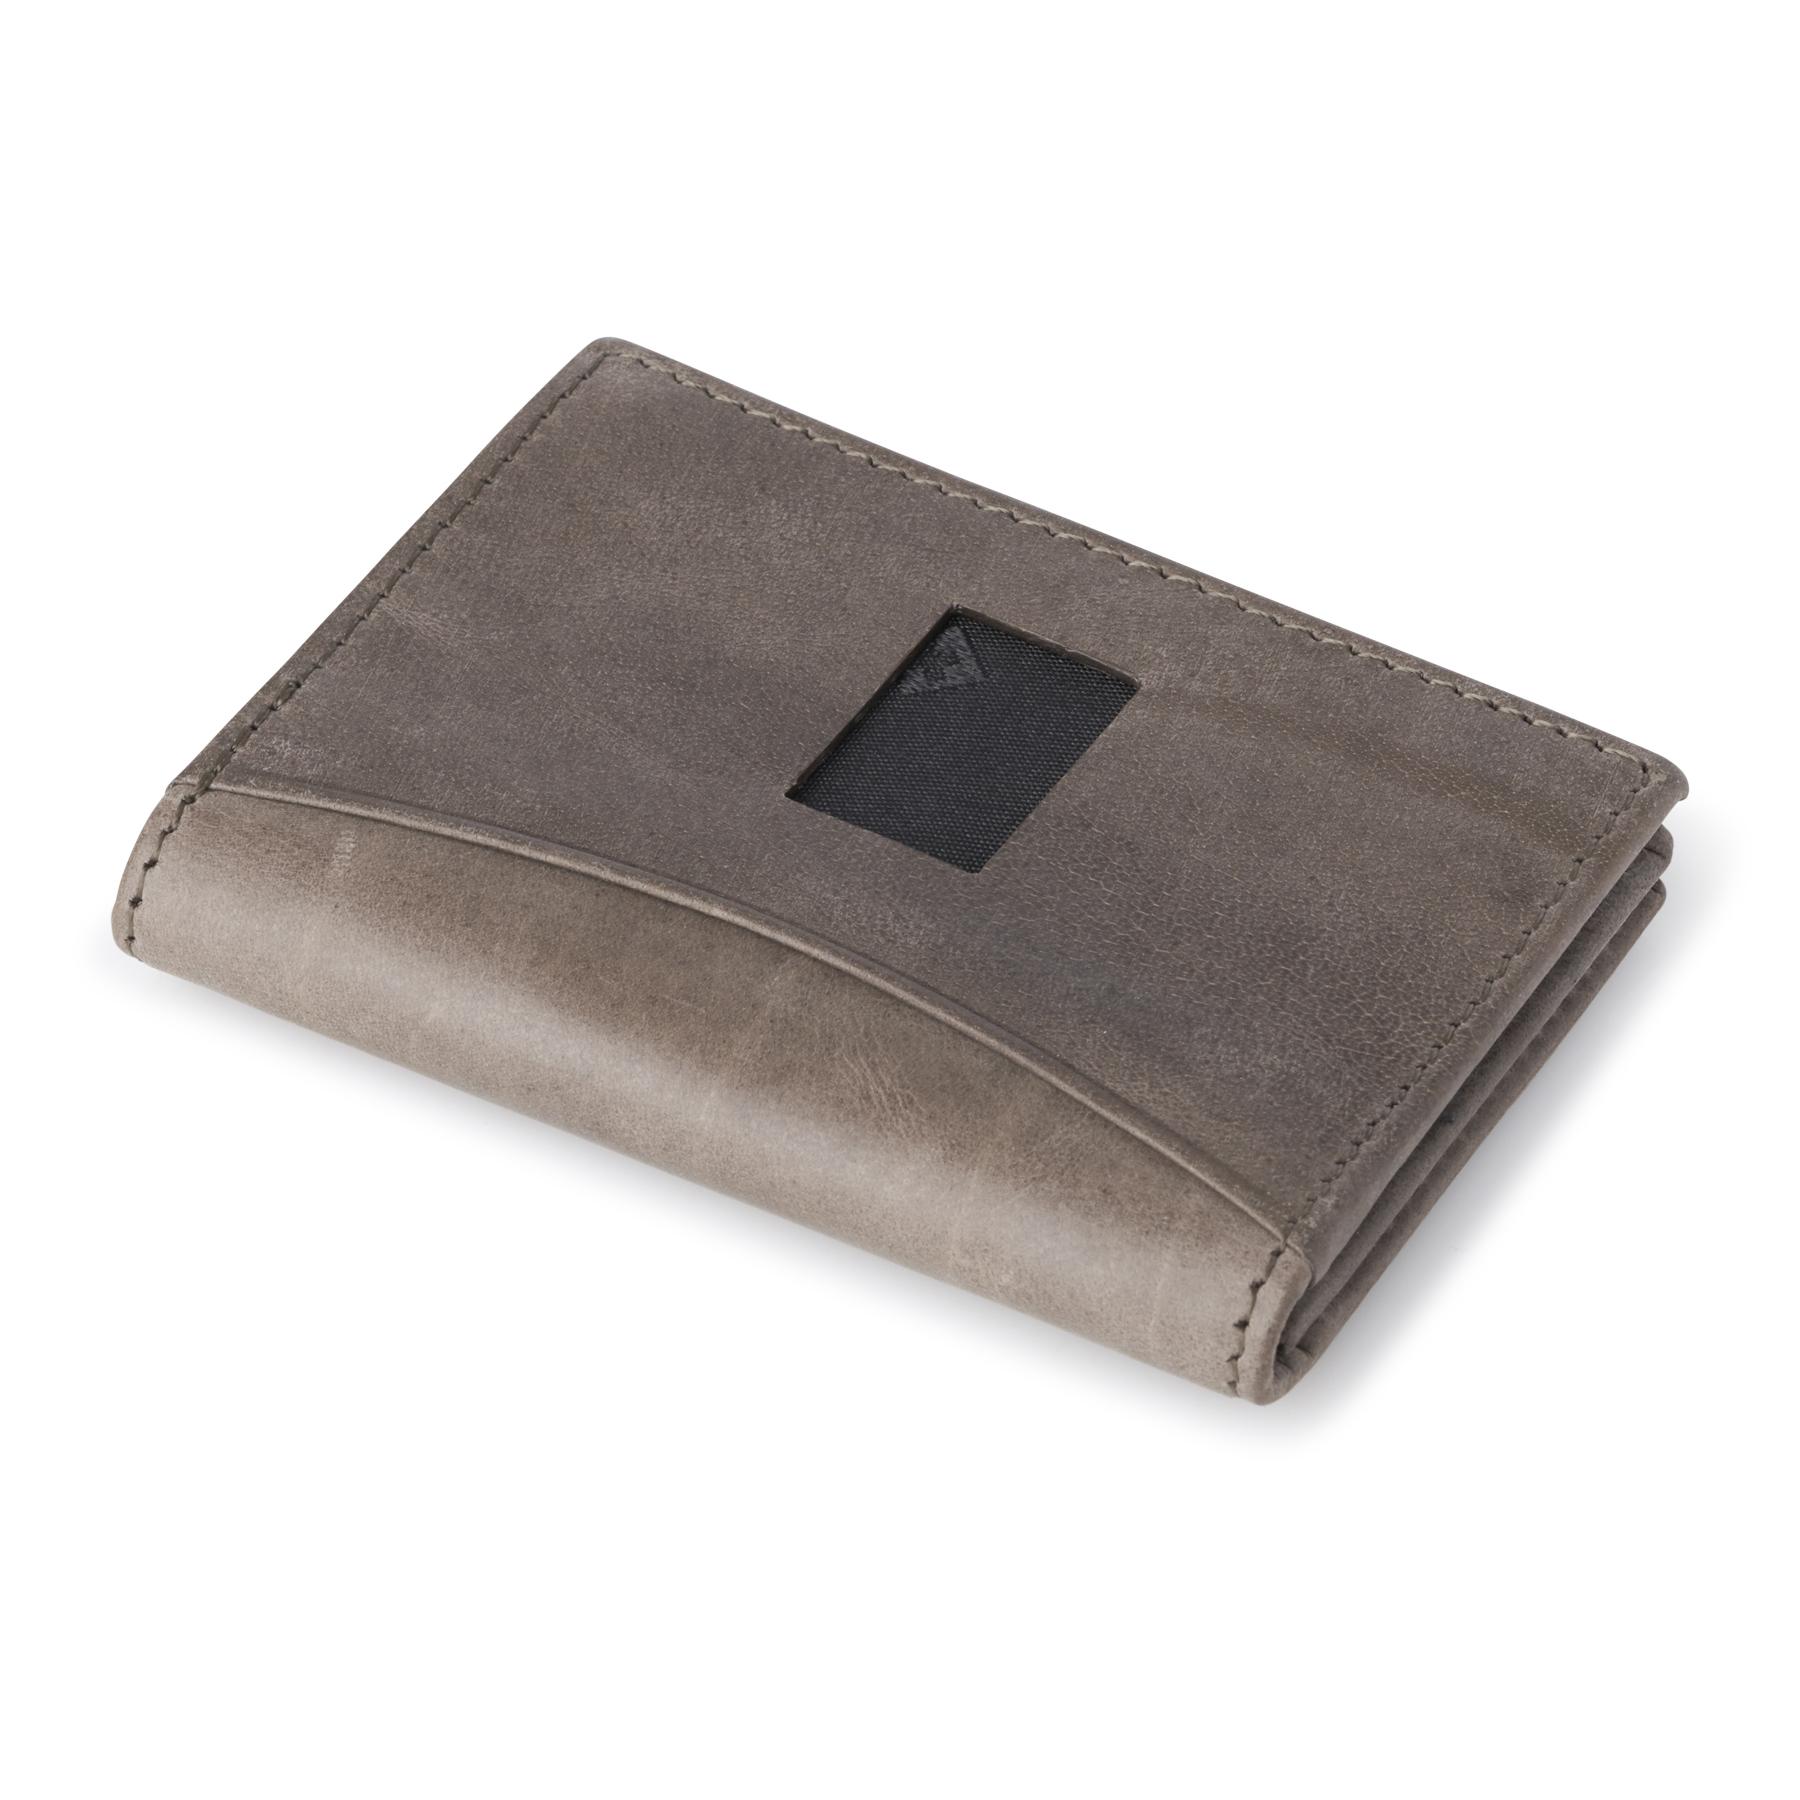 Alpine-Swiss-RFID-Leather-Business-Card-Wallet-Minimalist-ID-Window-Card-Holder thumbnail 46